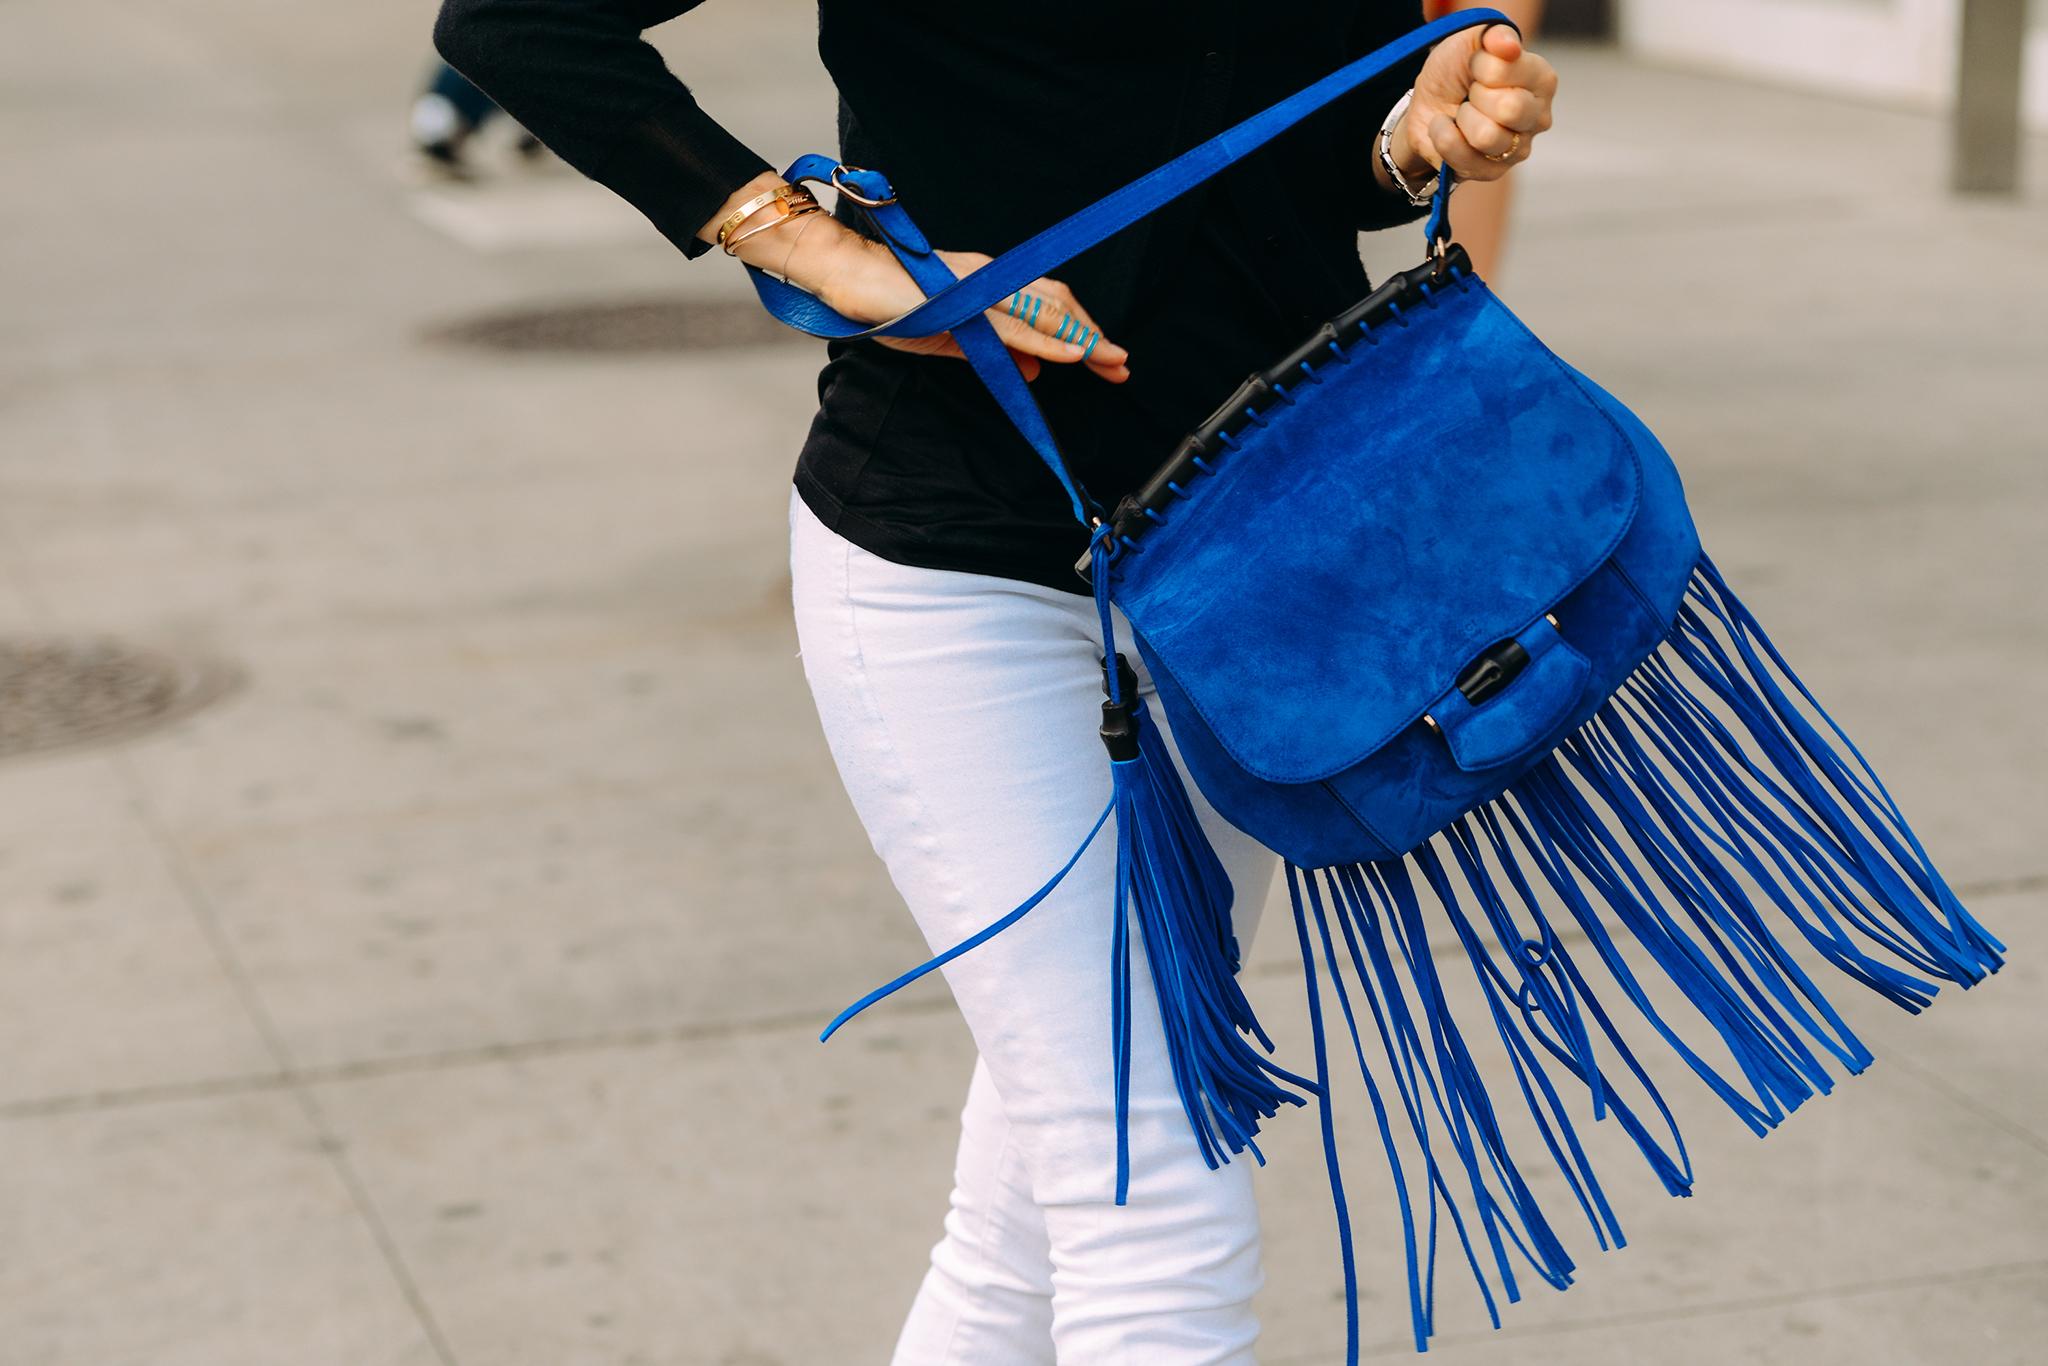 Blue power: Οι τσάντες που θα κυριαρχήσουν τον χειμώνα